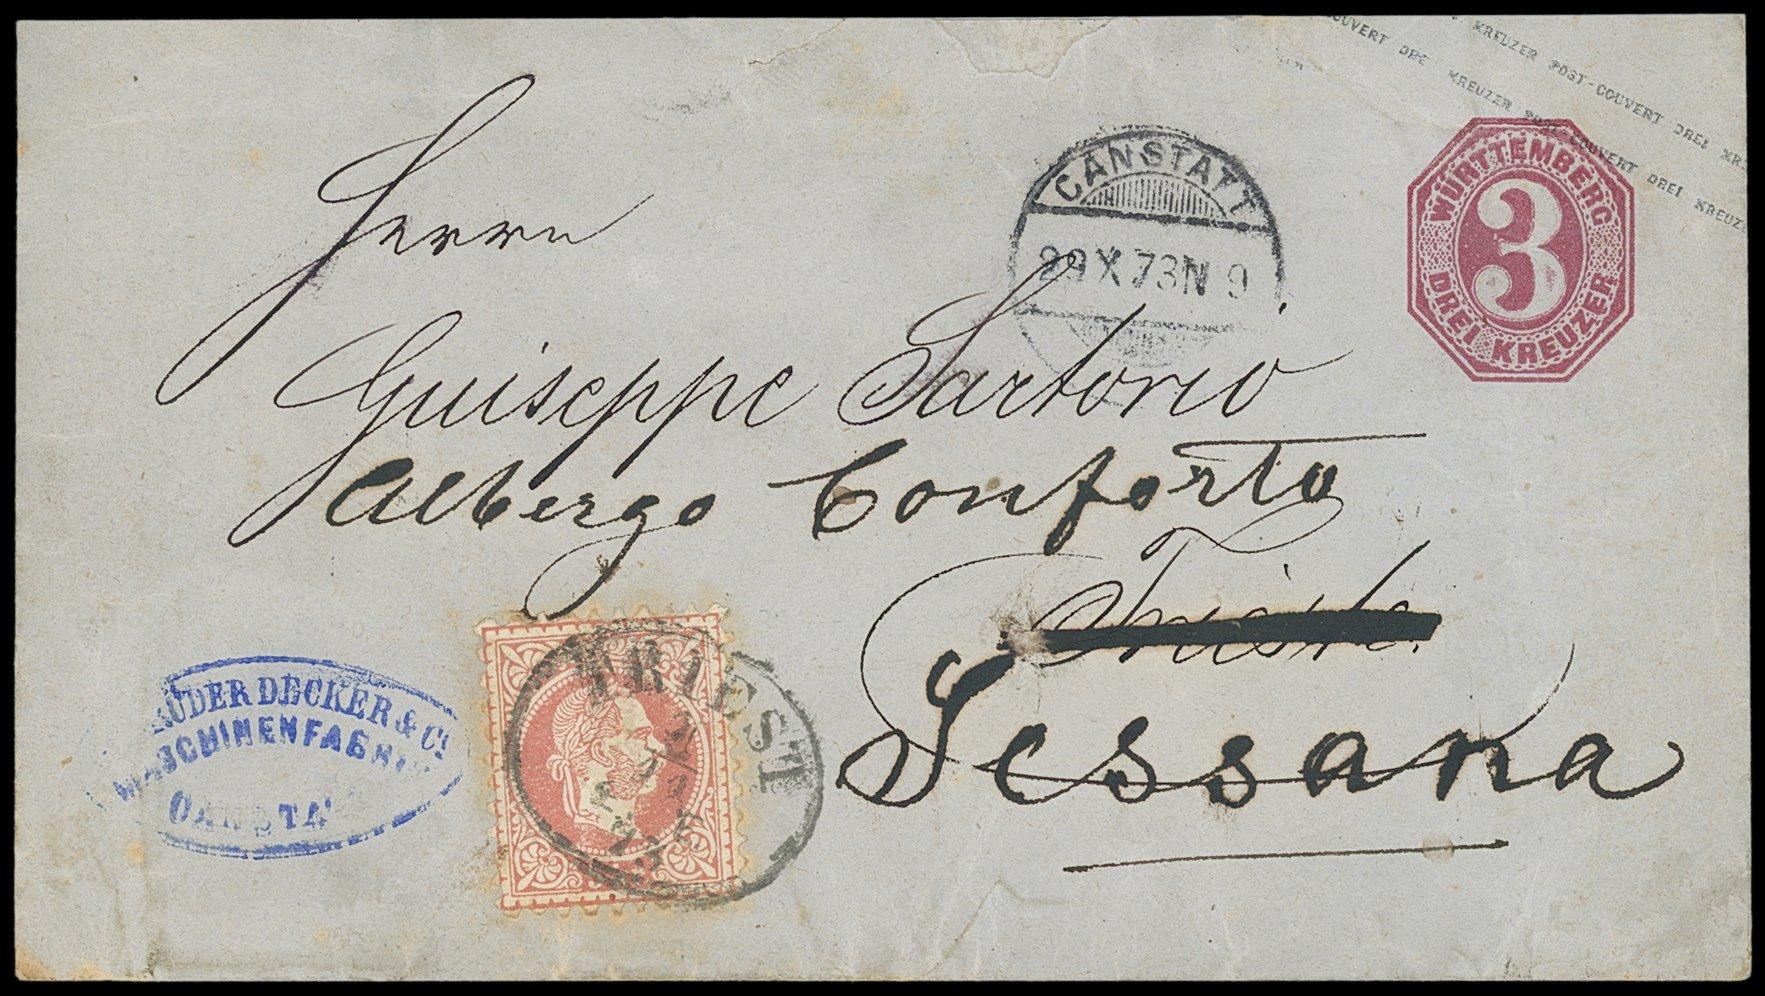 Lot 844 - Wurttemberg Württemberg - postal stationery -  Sellschopp Auktionen GmbH Auction #1